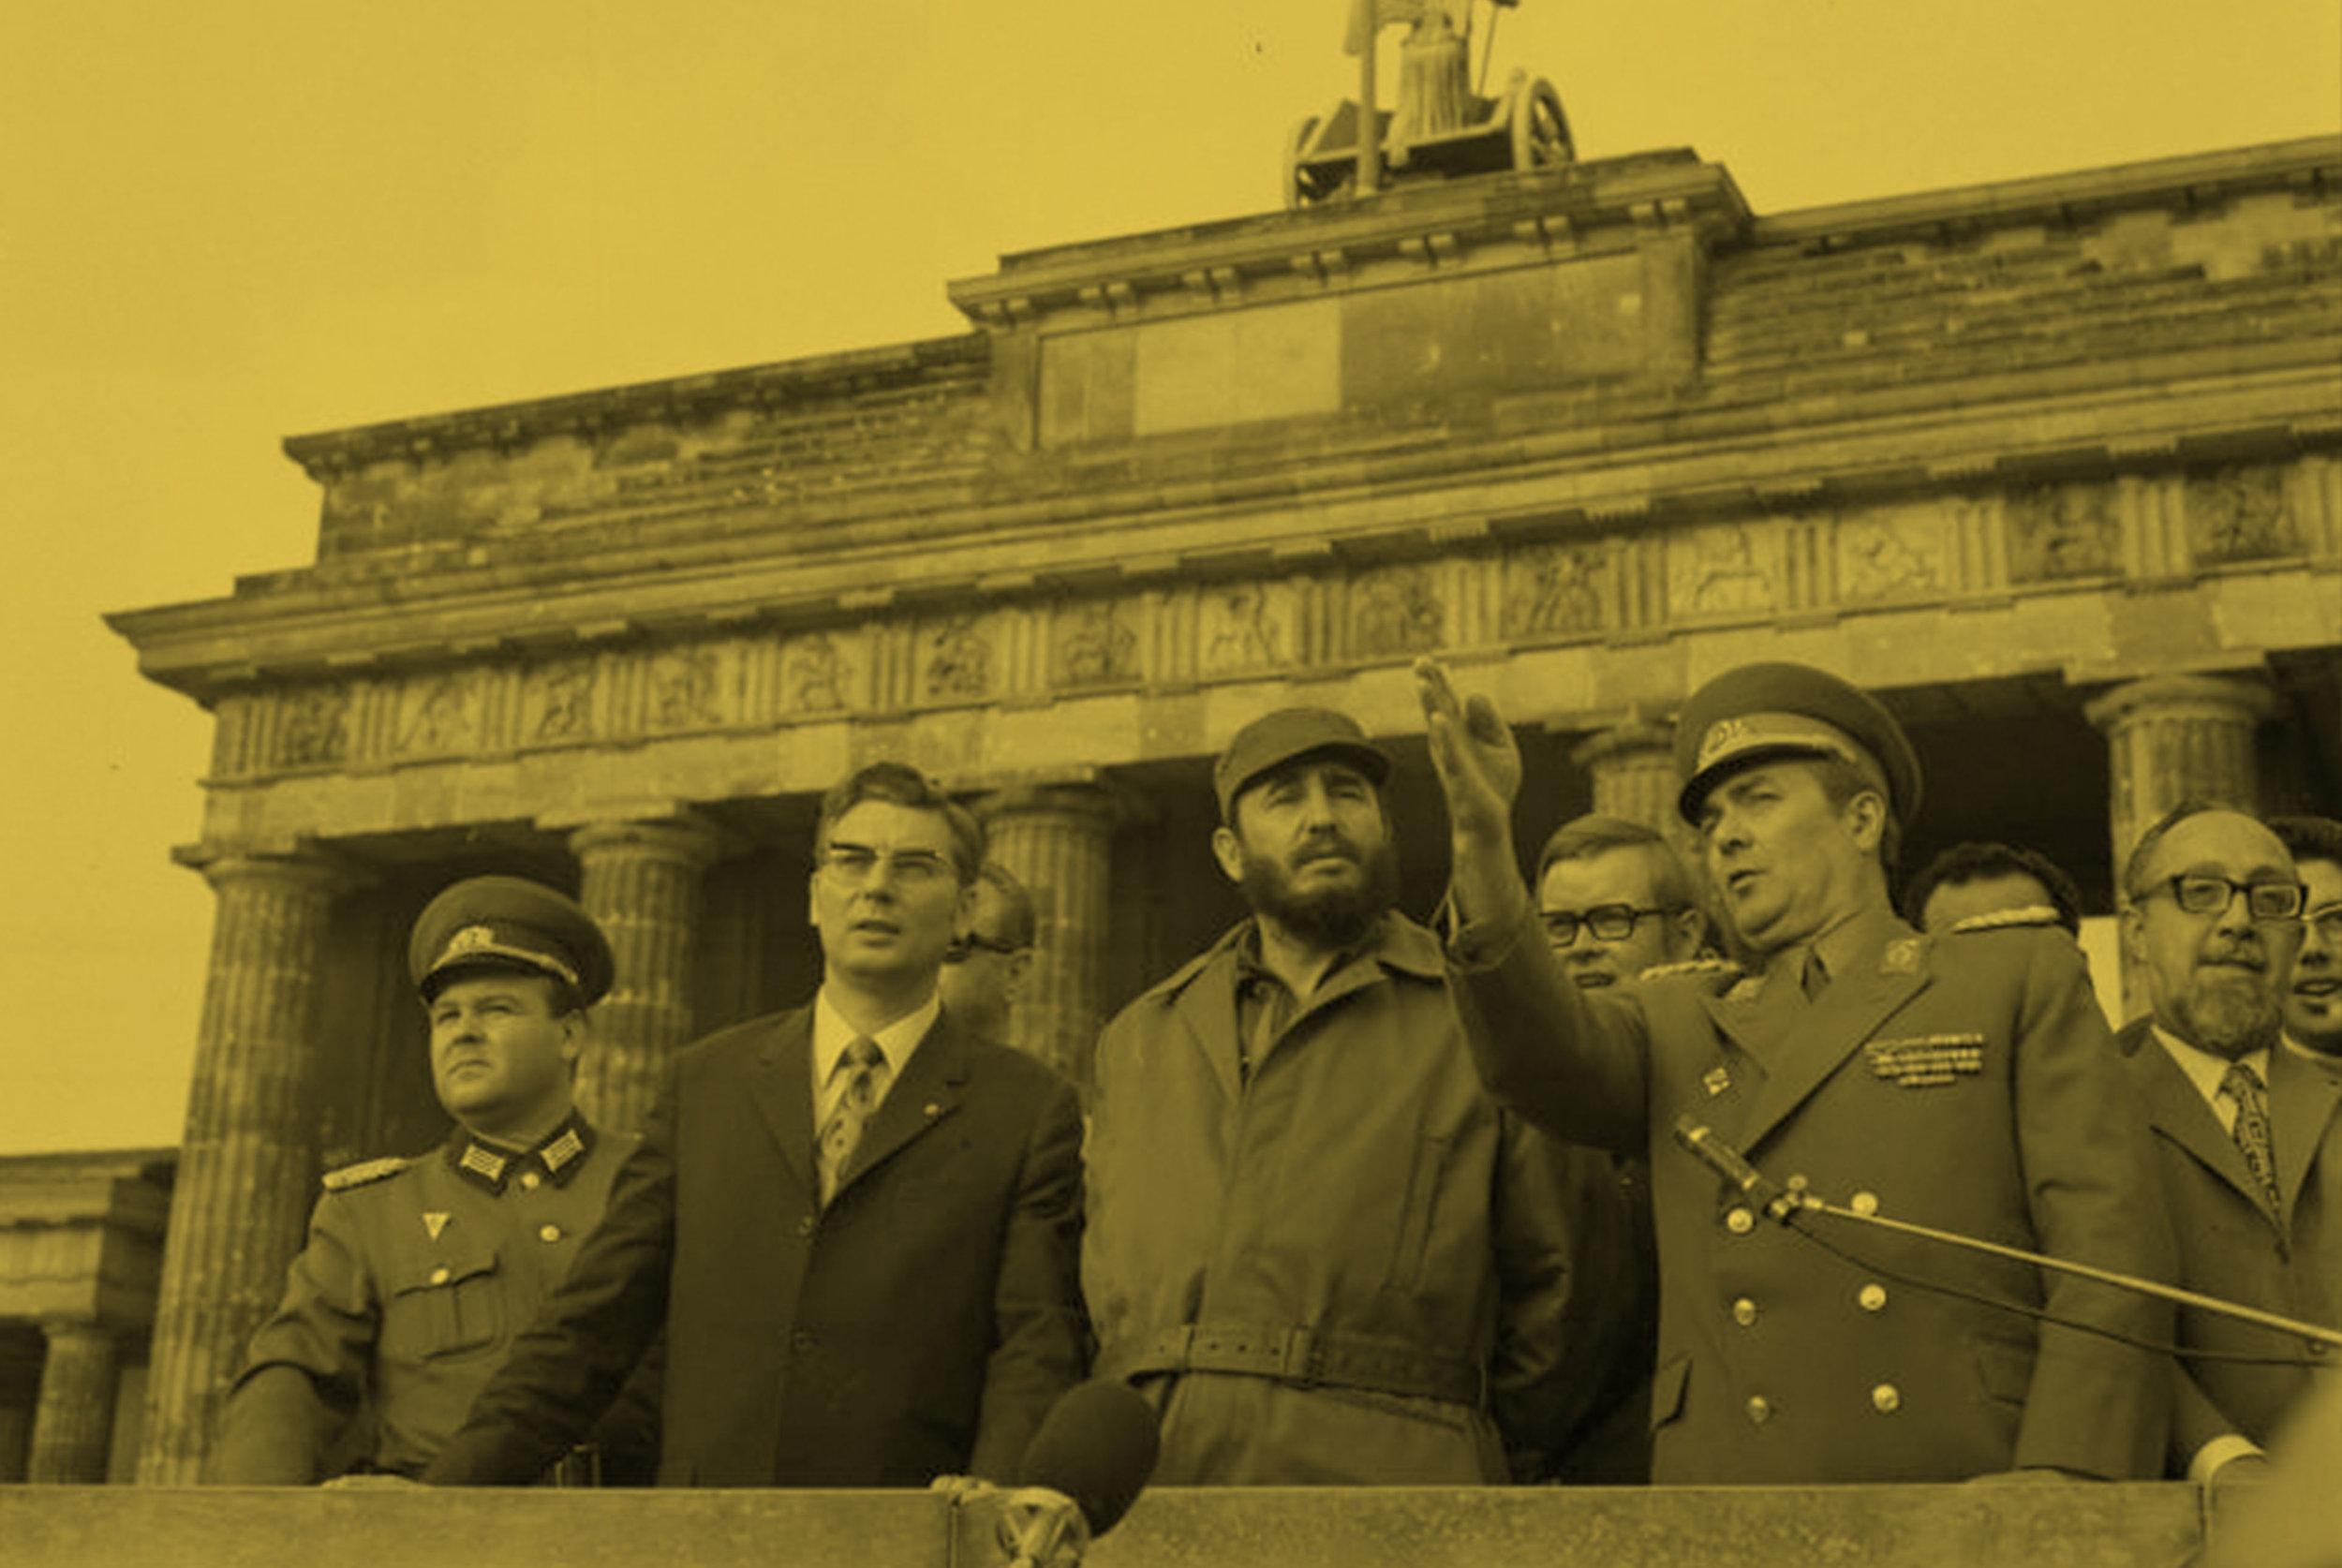 A HERO OR A TYRANT?  Rupert Cornwell examines Fidel Castro's legacy.